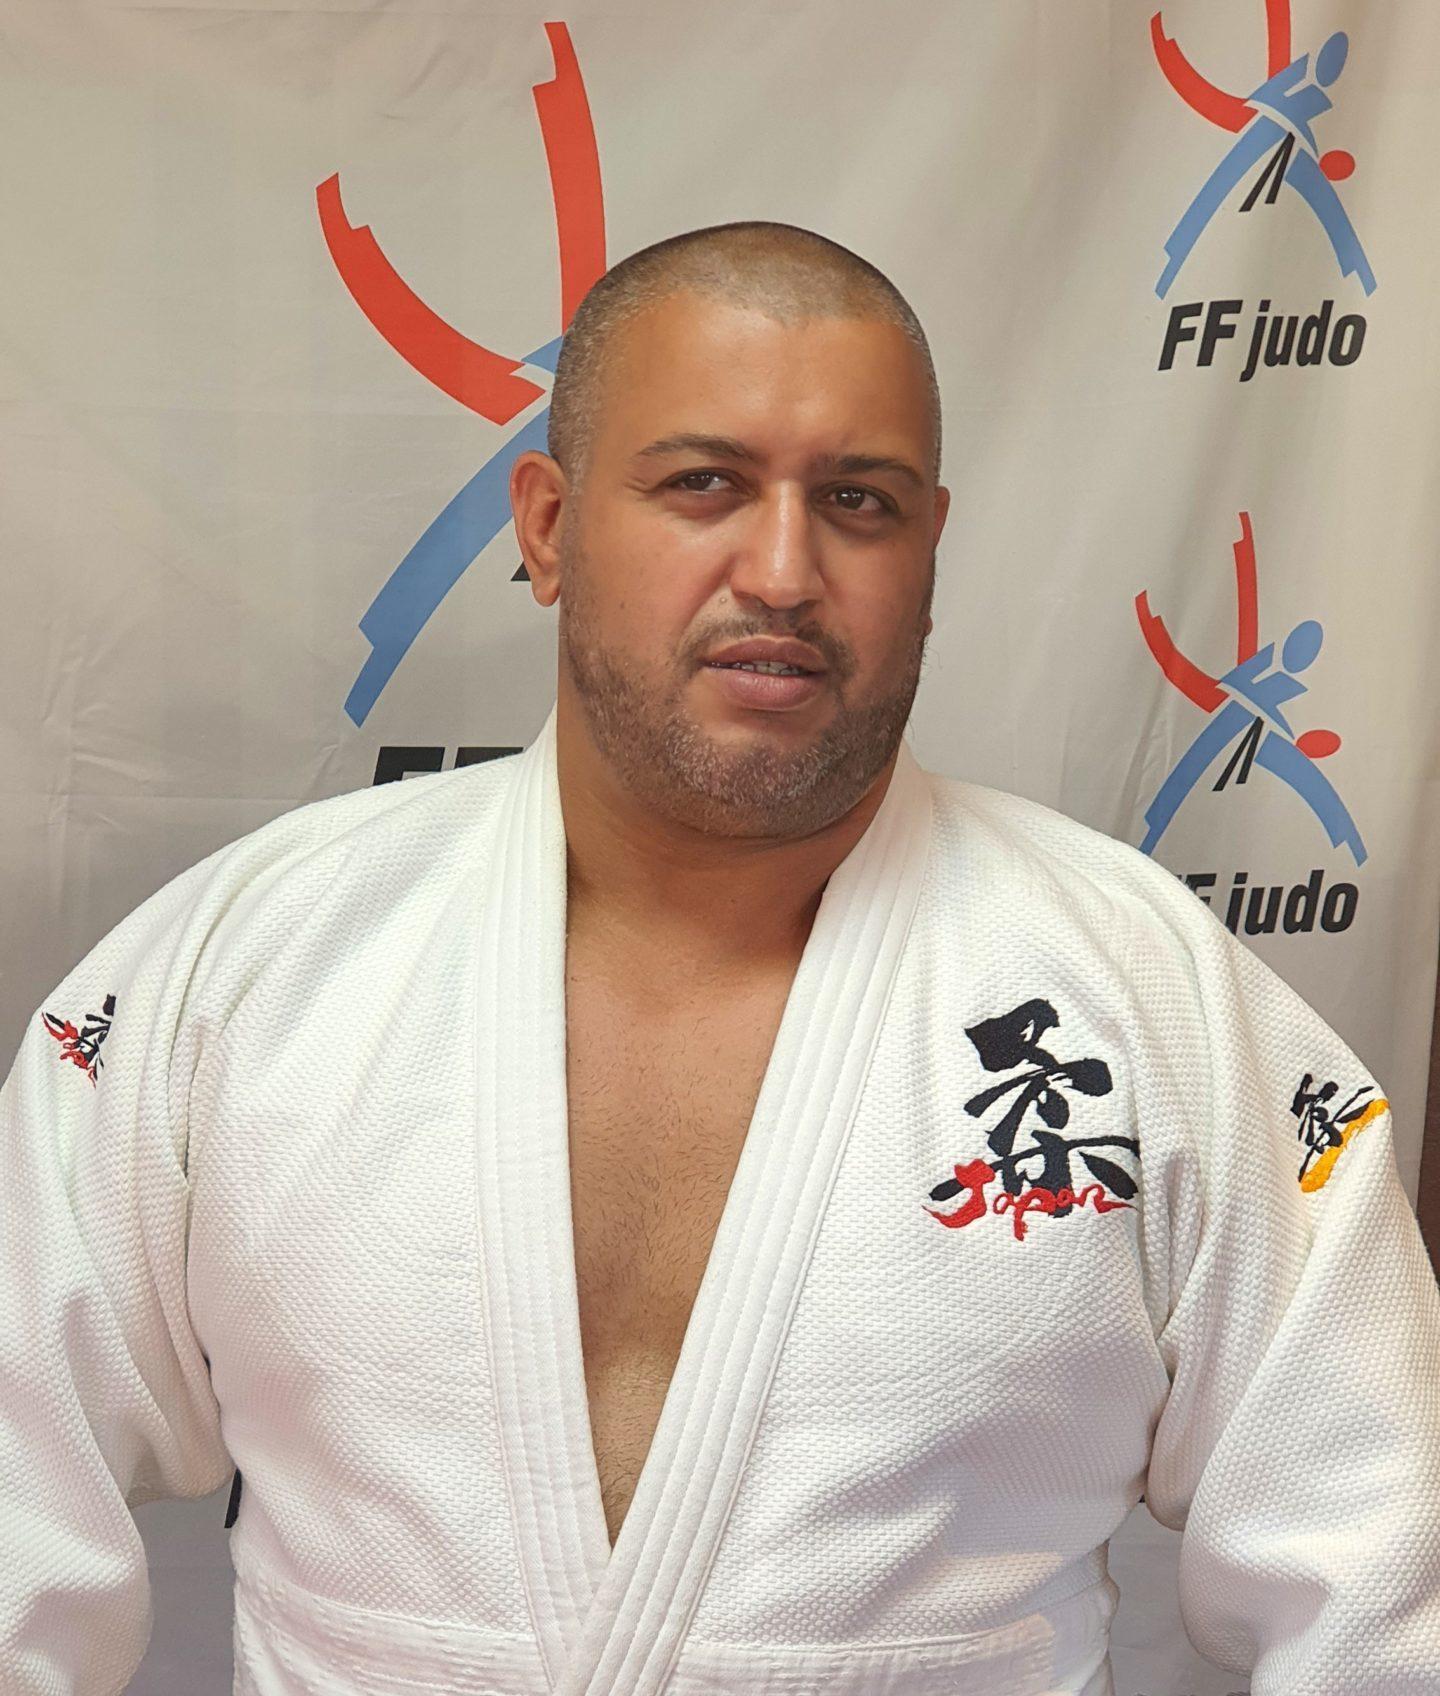 Abdel R. Zougar